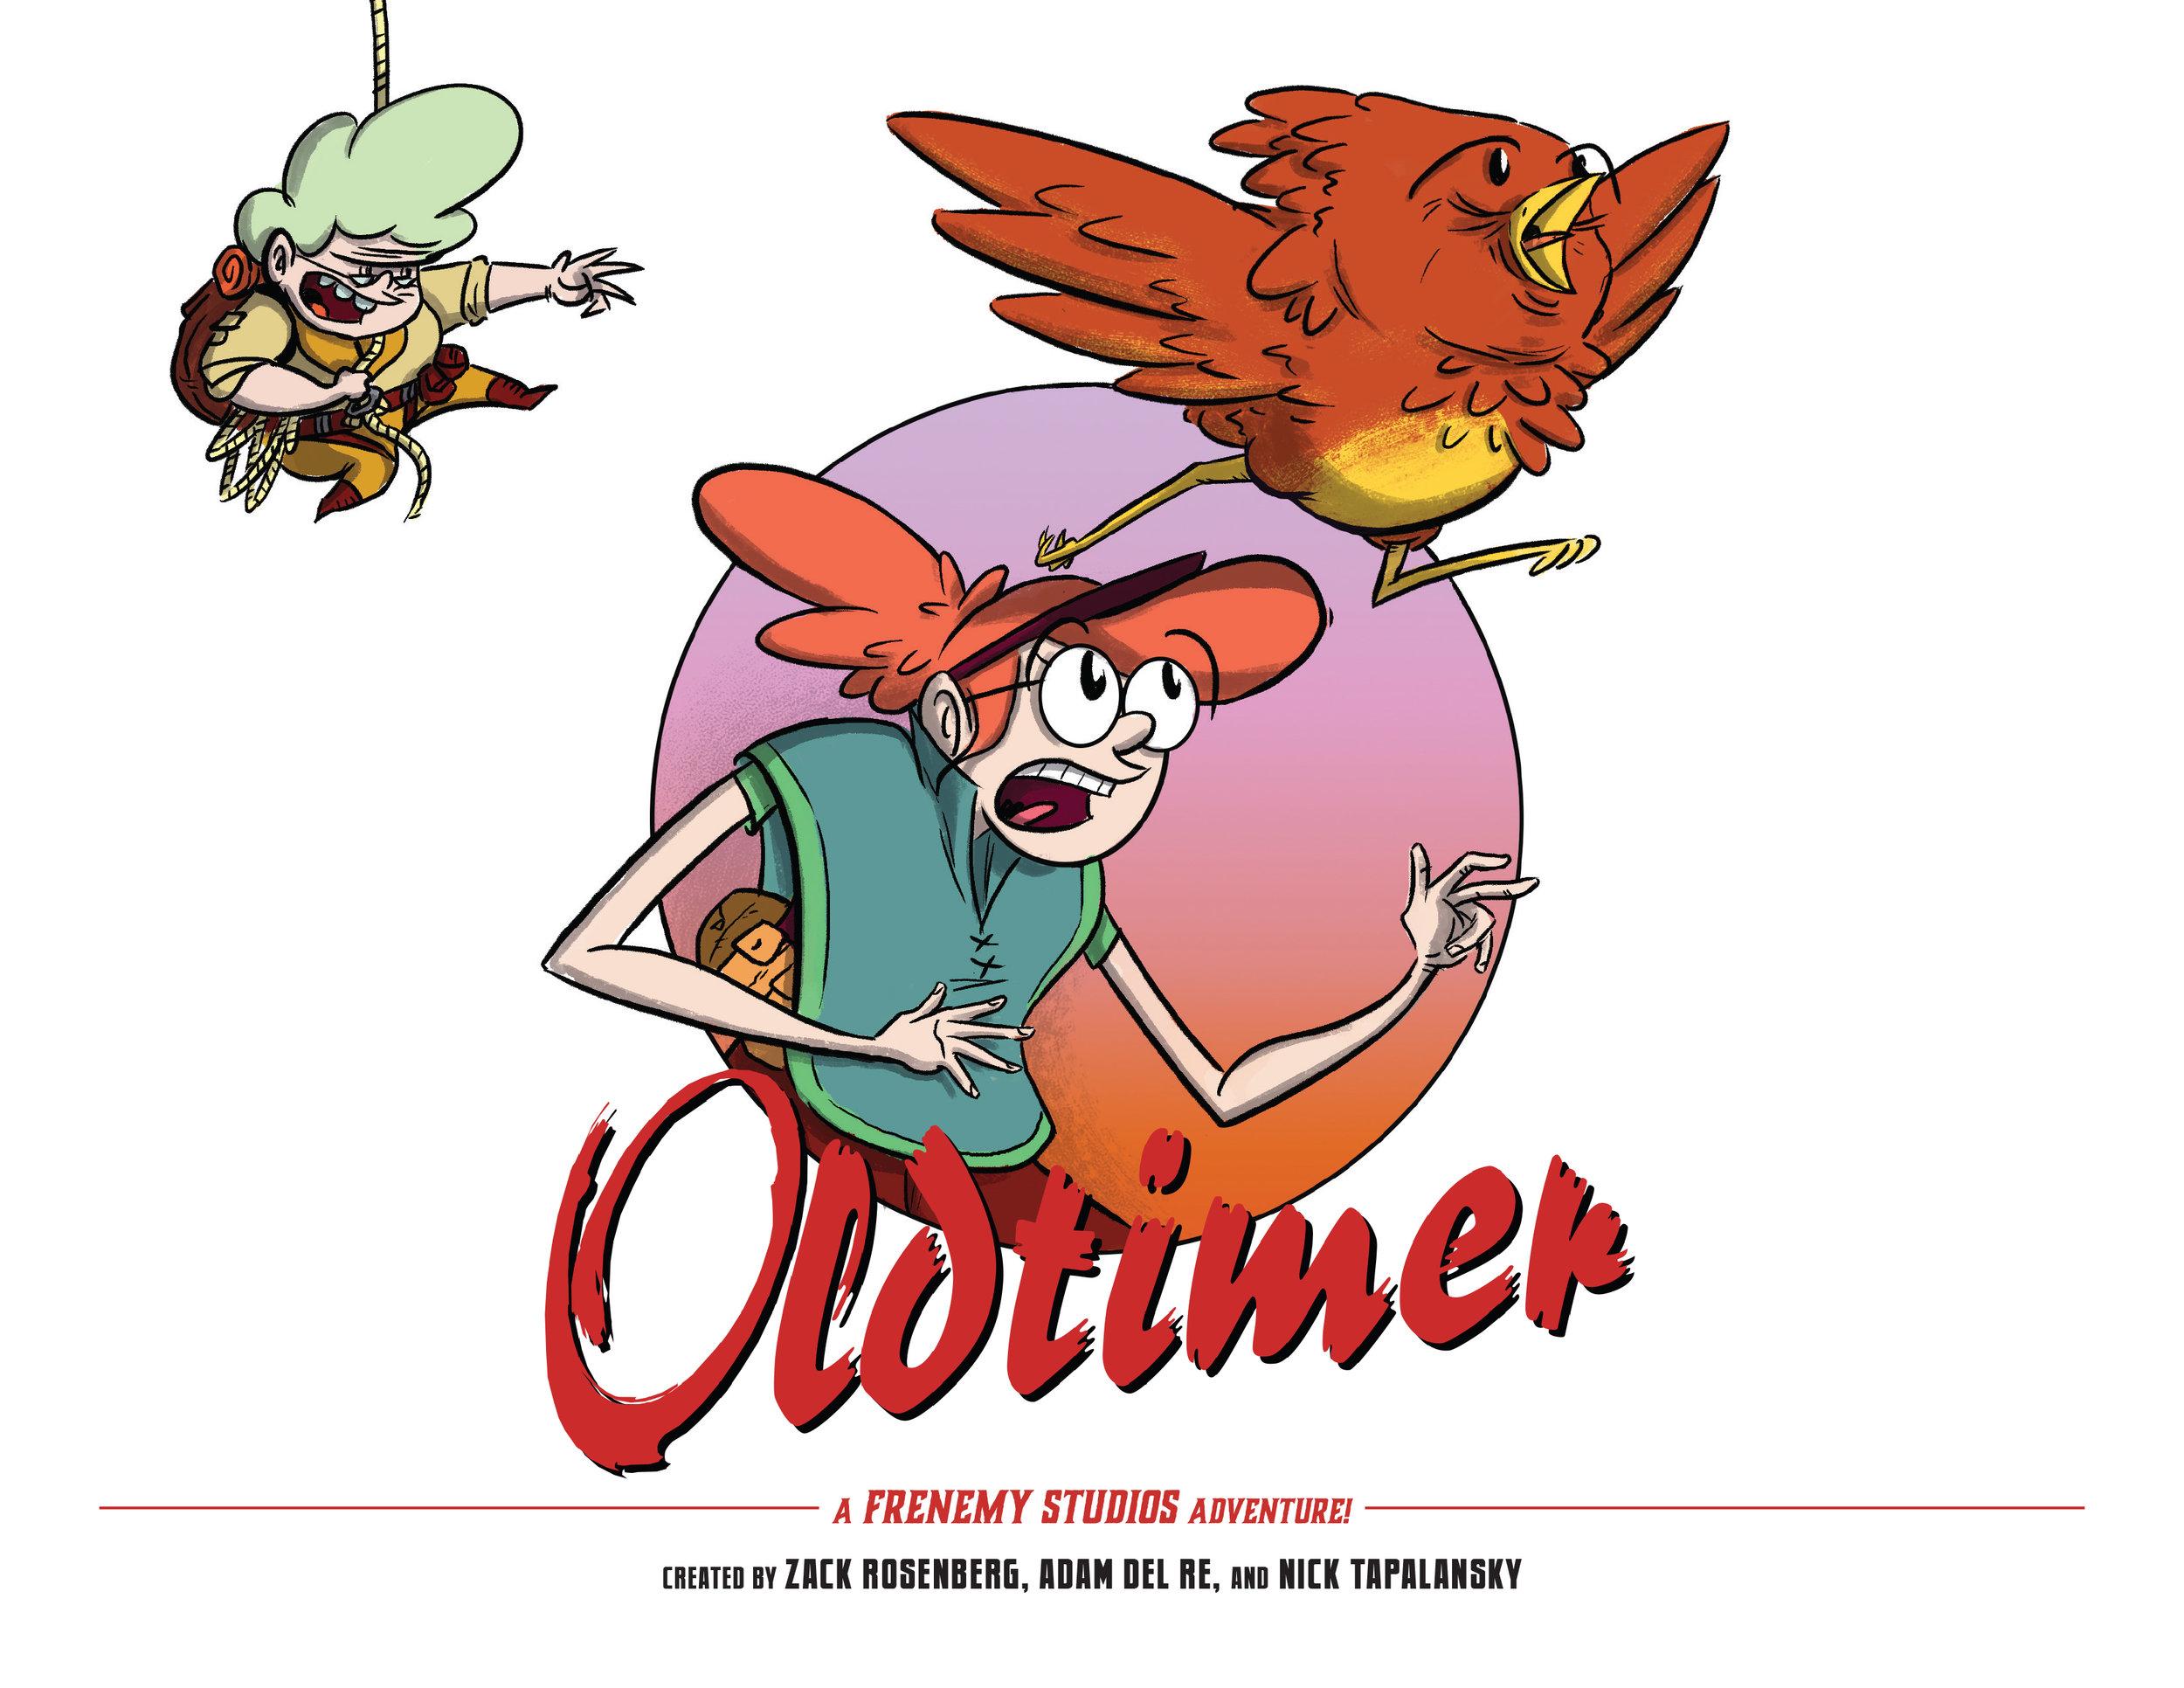 Oltimer_Animation_Package_01-2018-1.jpg